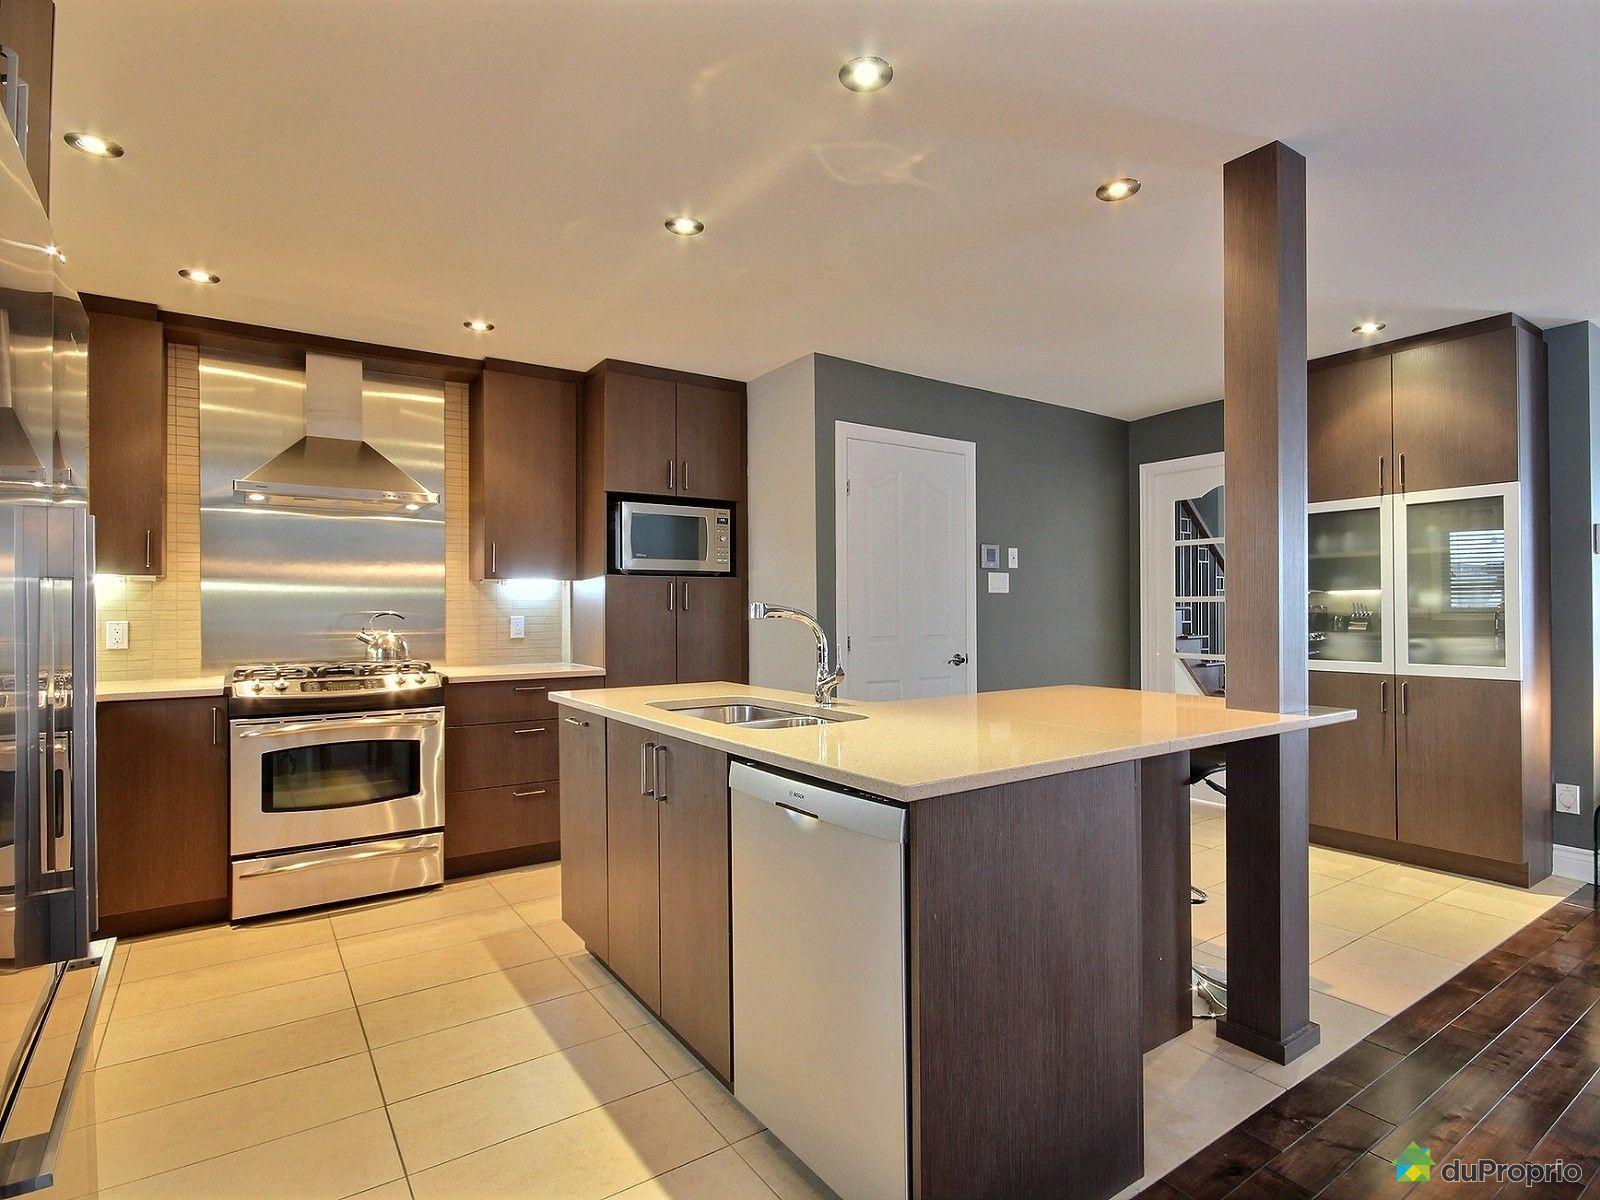 bi g n ration vendre chambly 1651 rue de la fresni re immobilier qu bec duproprio 689893. Black Bedroom Furniture Sets. Home Design Ideas